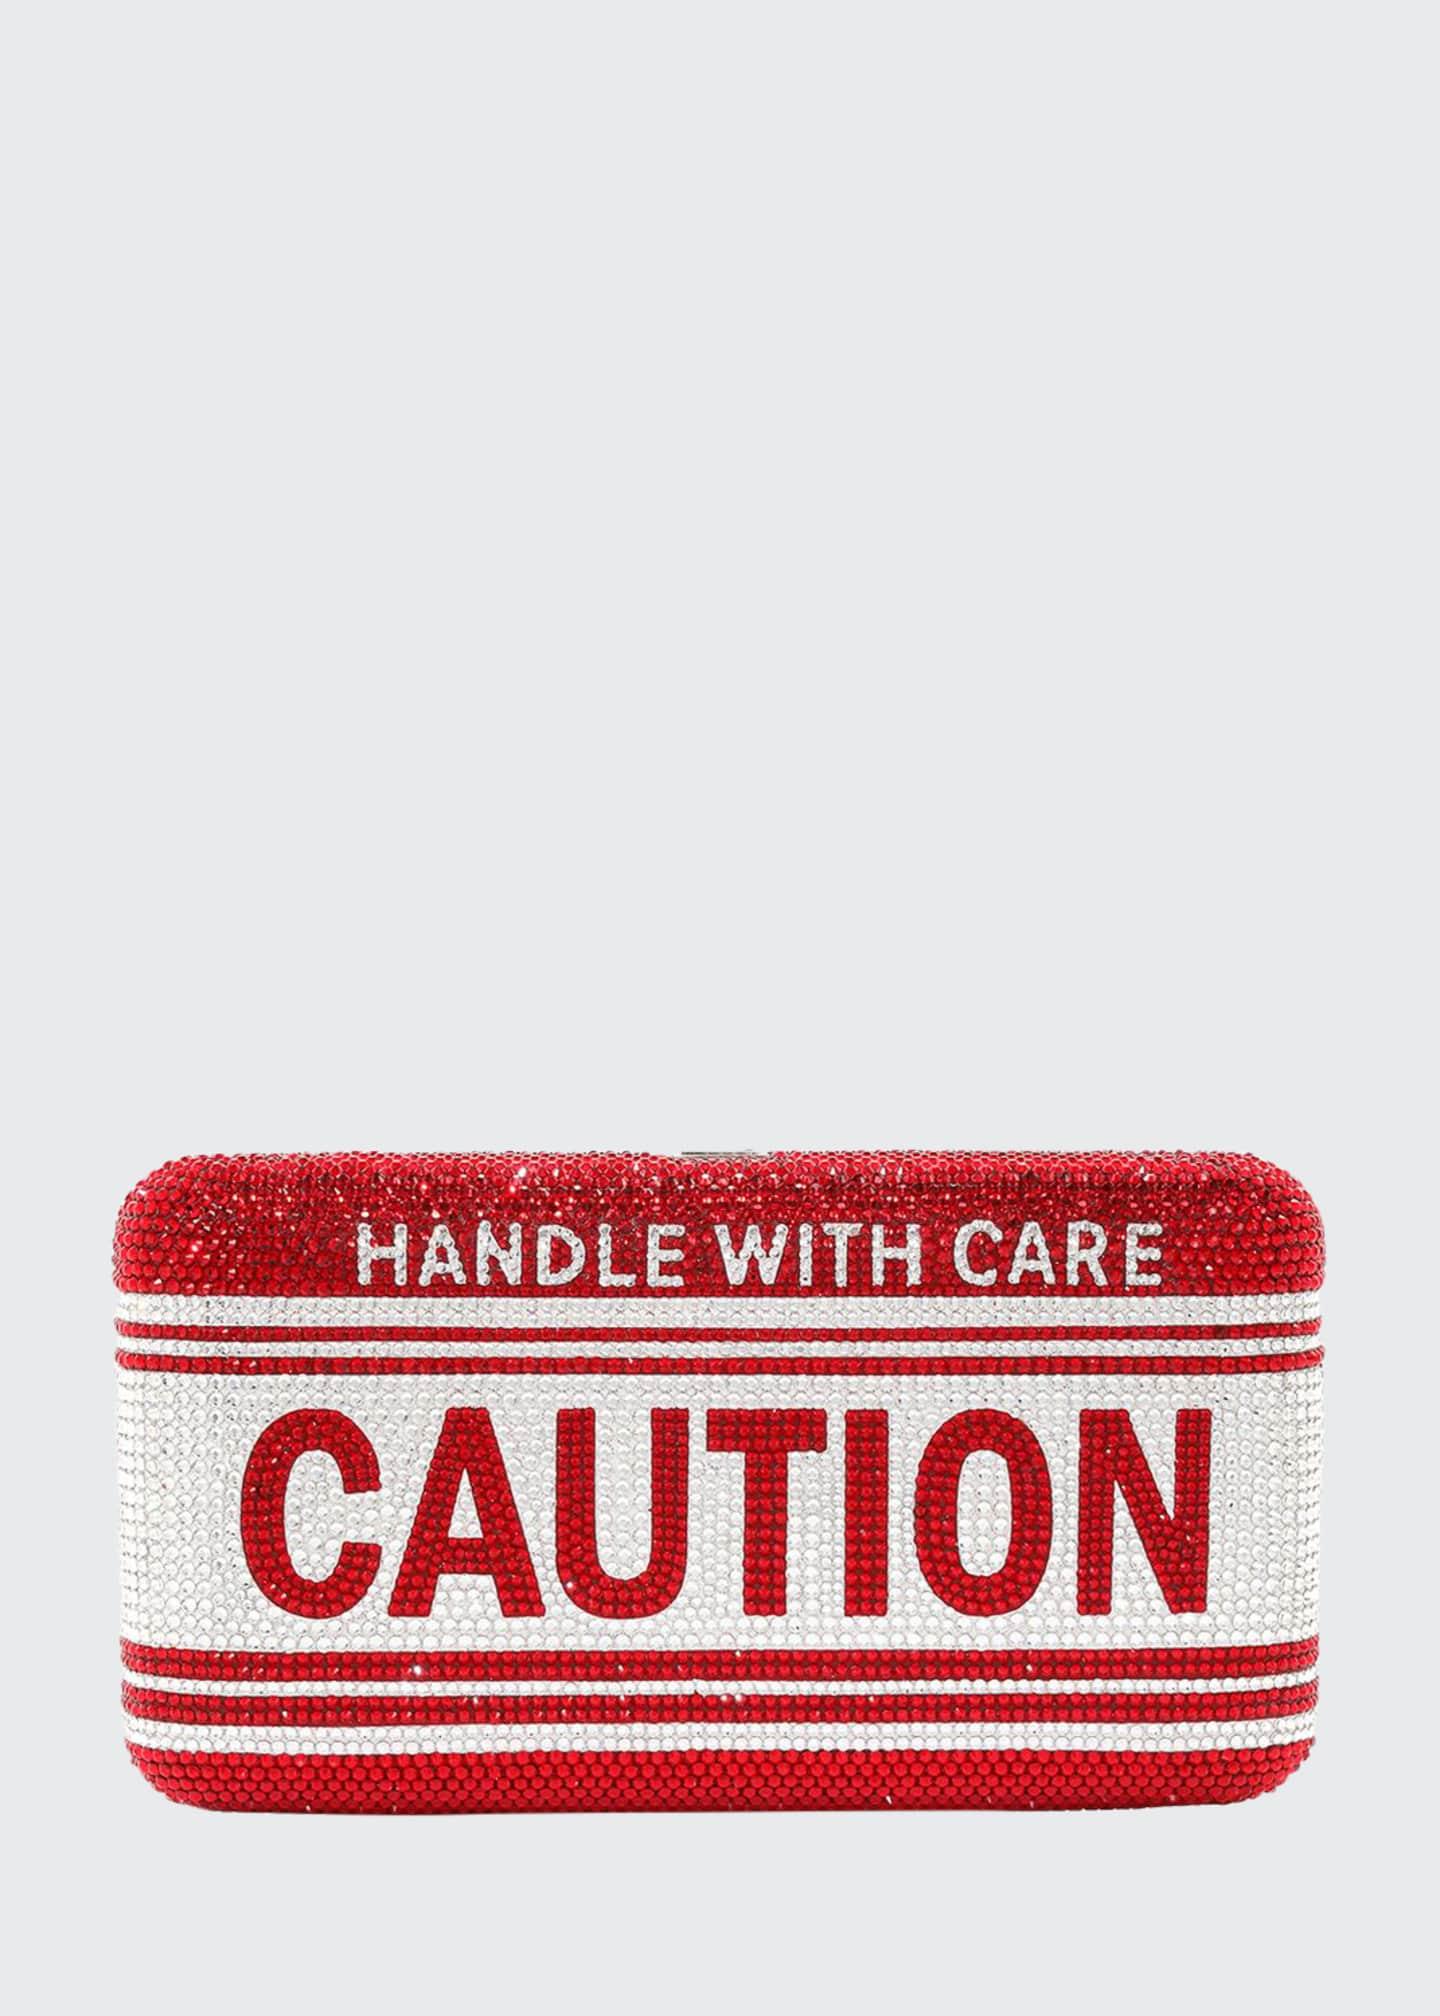 Judith Leiber Couture Crystal Fragile Caution Smooth Rectangular